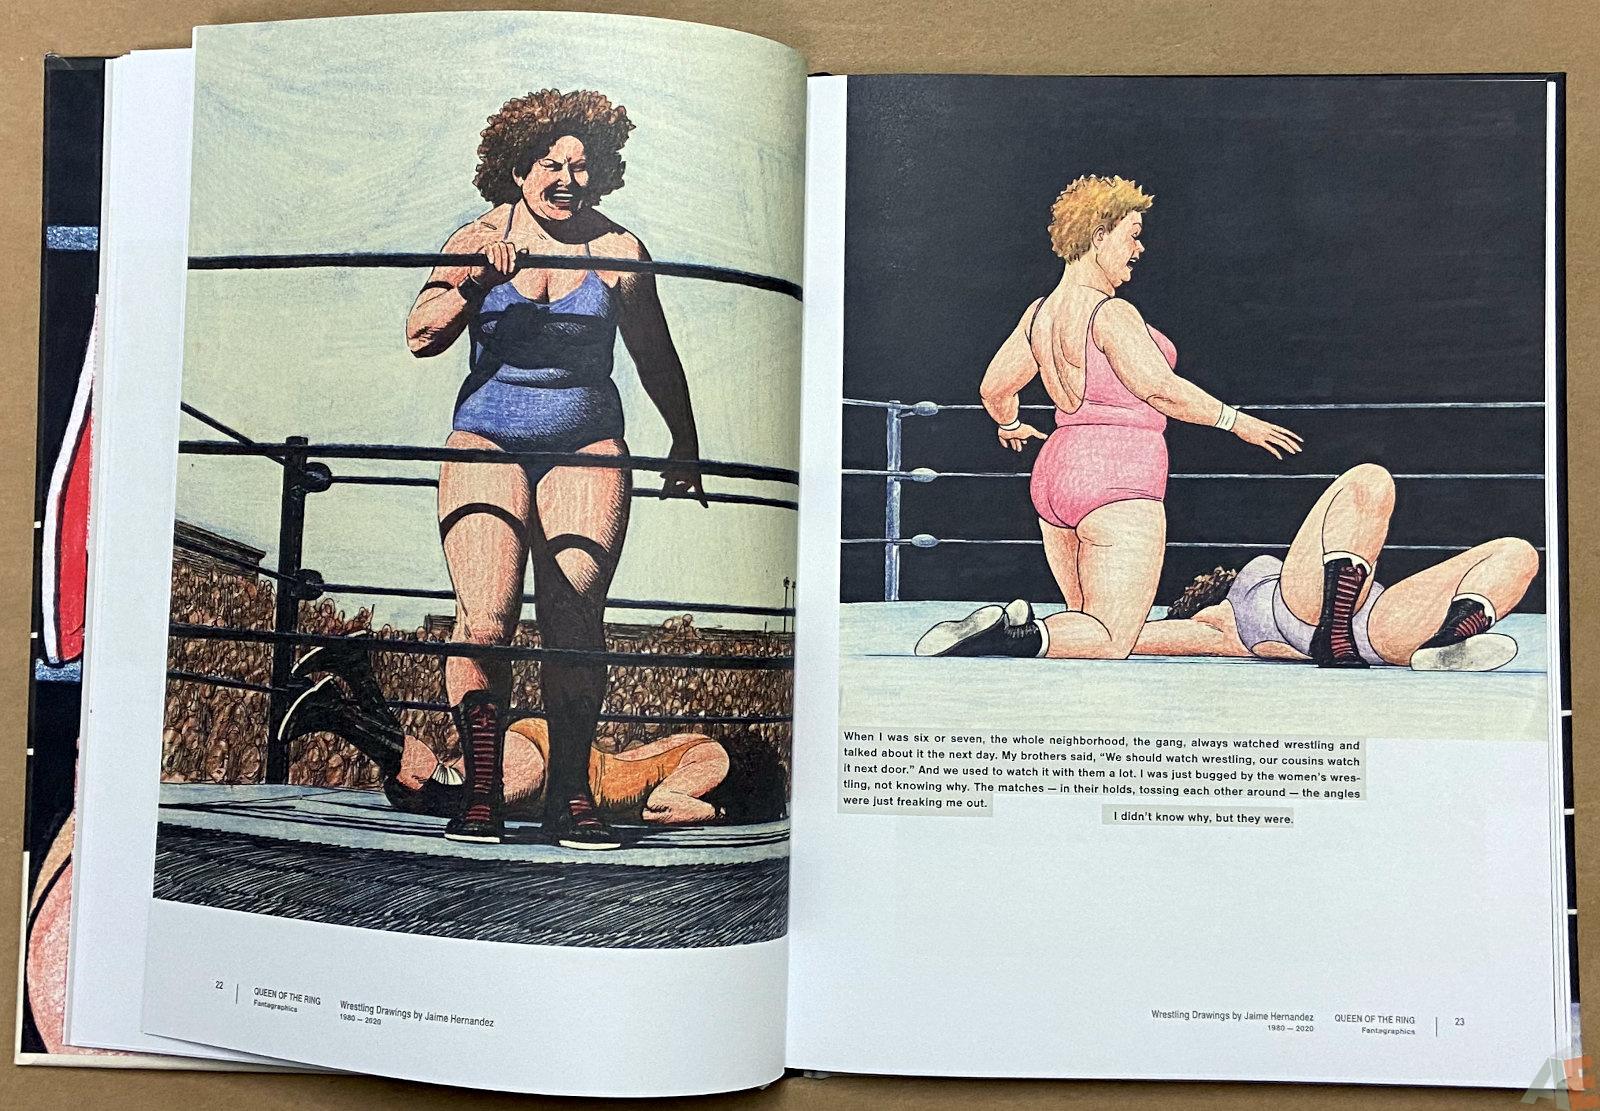 Queen of the Ring Wrestling Drawings by Jaime Hernandez 1980 2020 interior 4